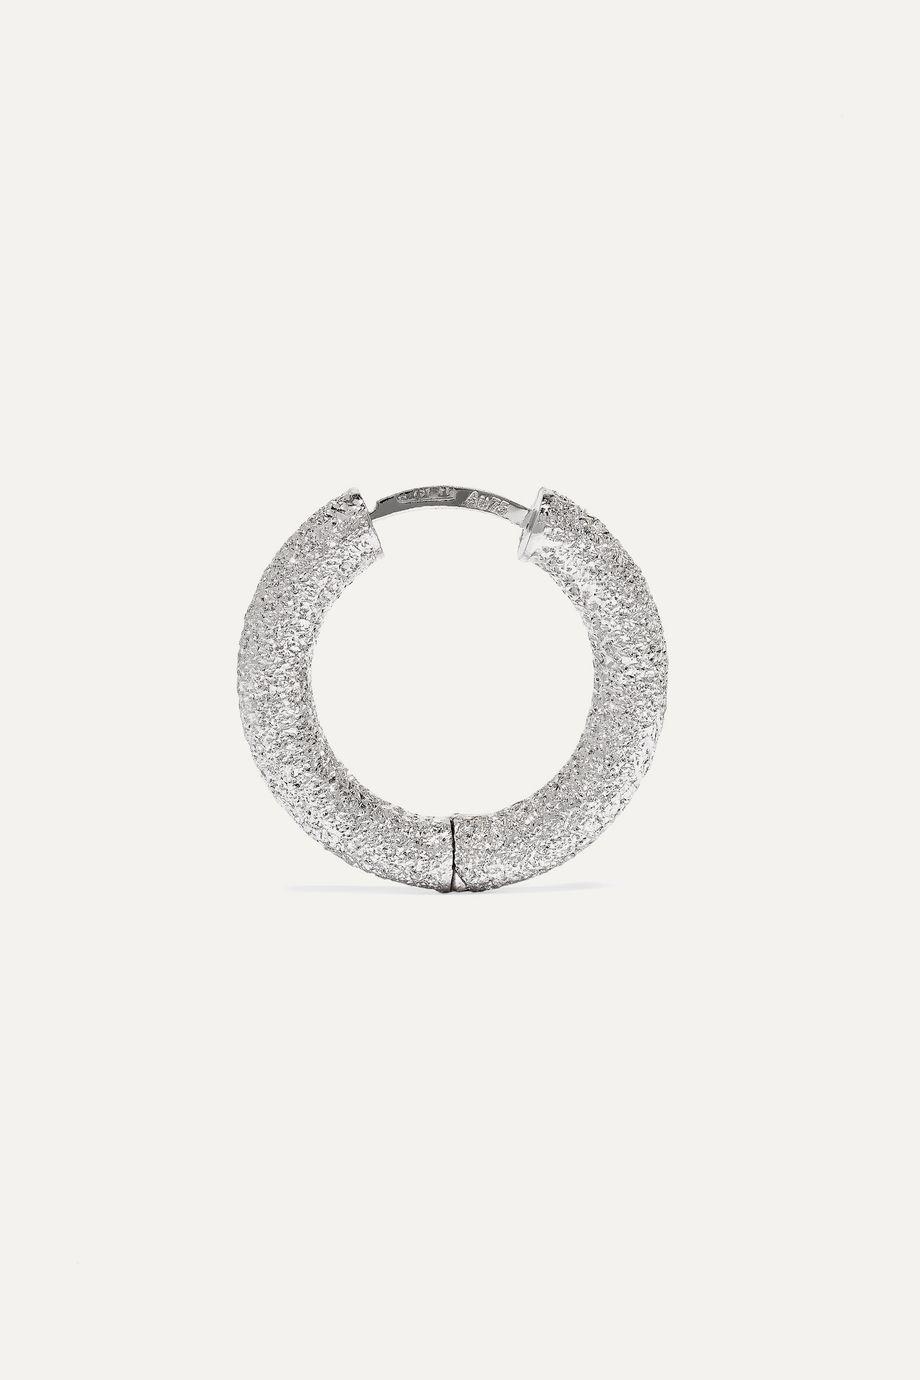 Carolina Bucci Florentine 18-karat white gold hoop earrings